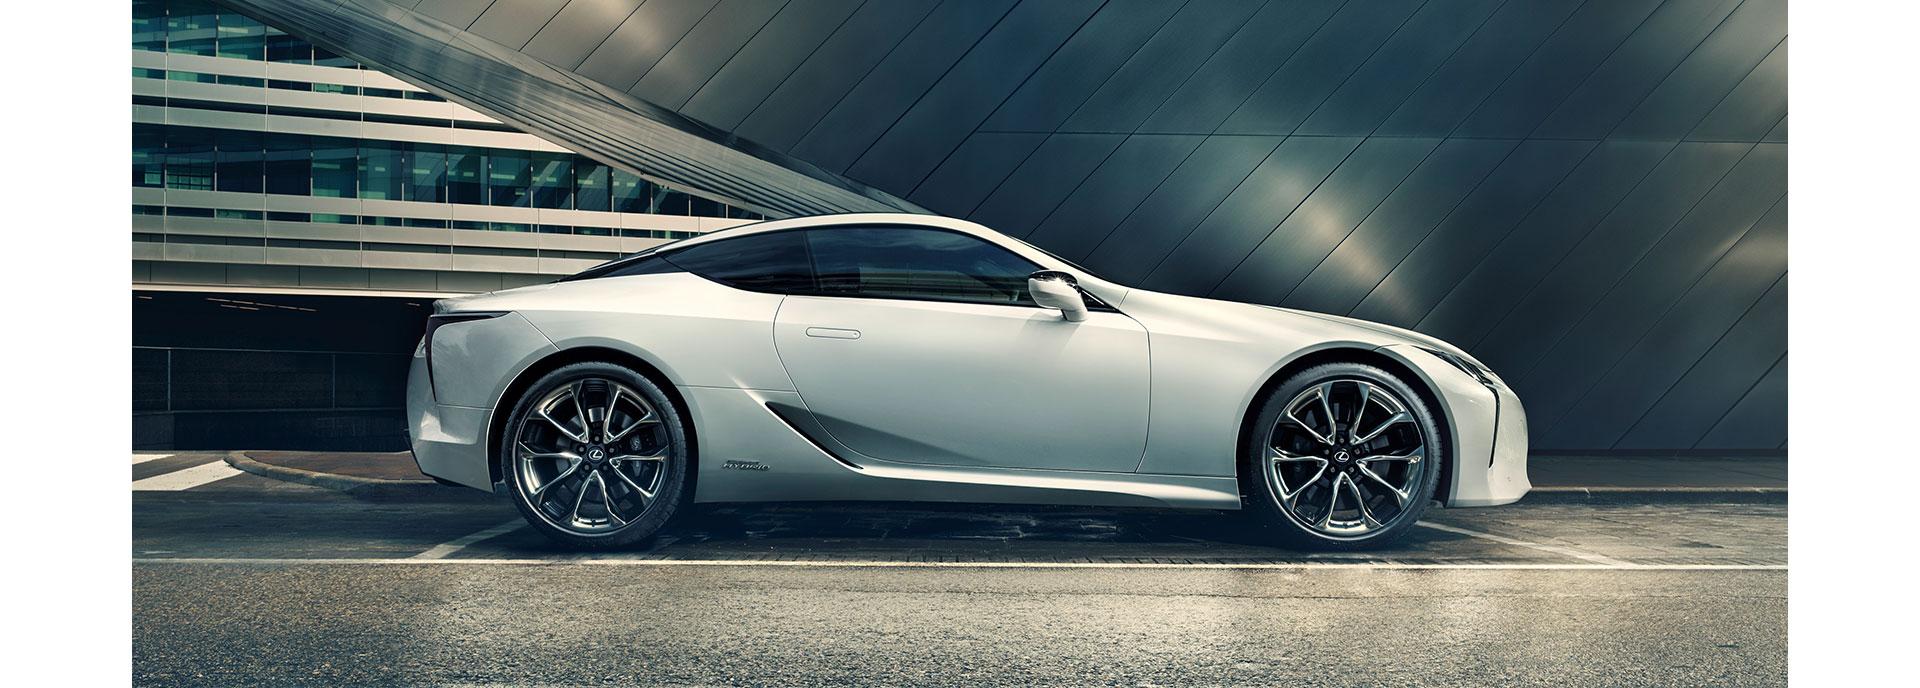 2017 Lexus LC 500 Unmistakable Profile